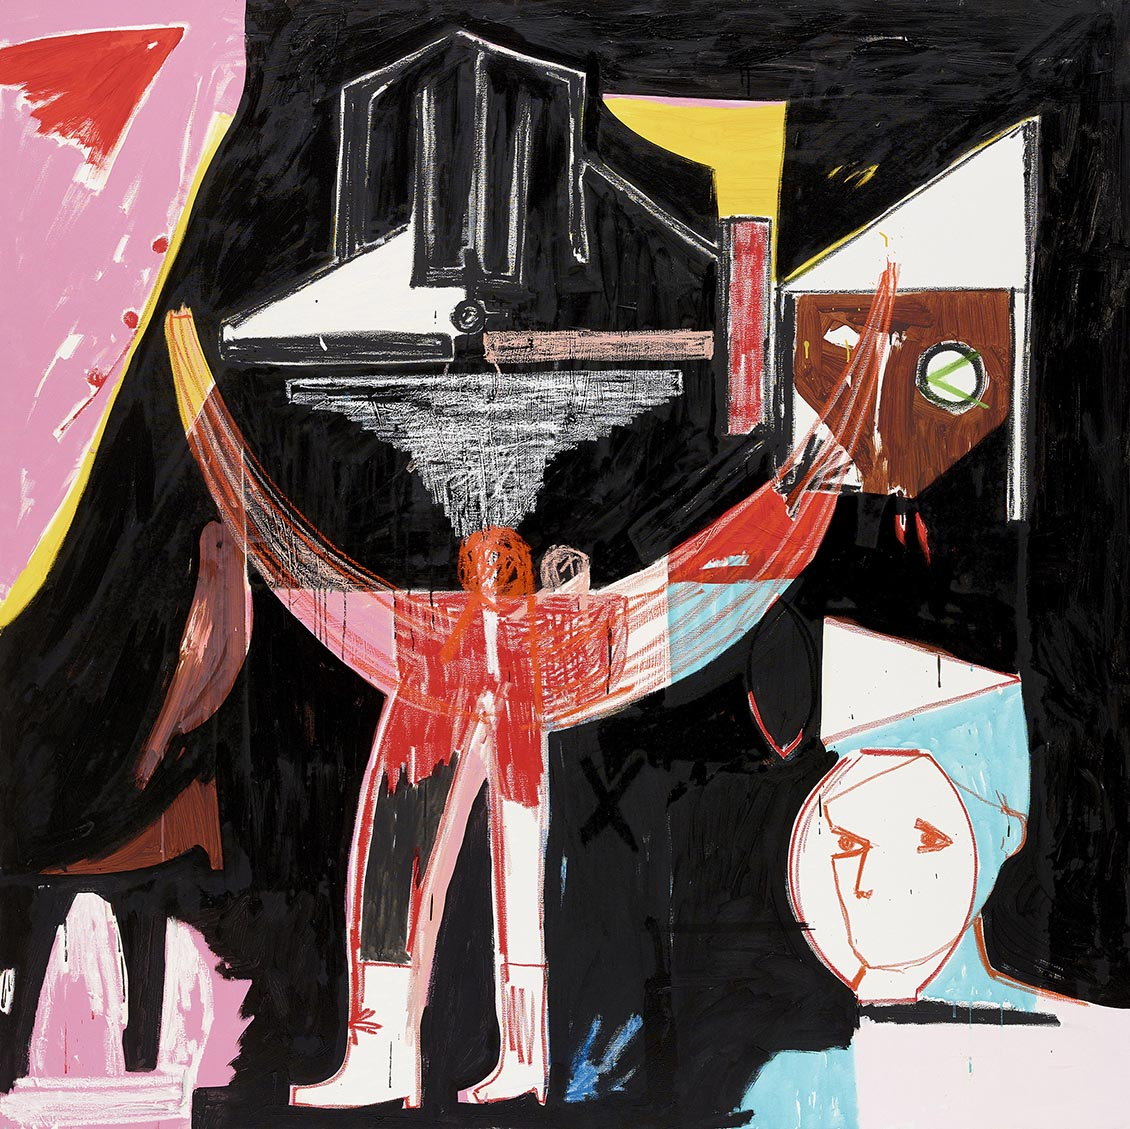 Farshad Farzankia, Himmelhunden, 2020. ARKEN Museum for Moderne Kunst. Foto: Malle Madsen